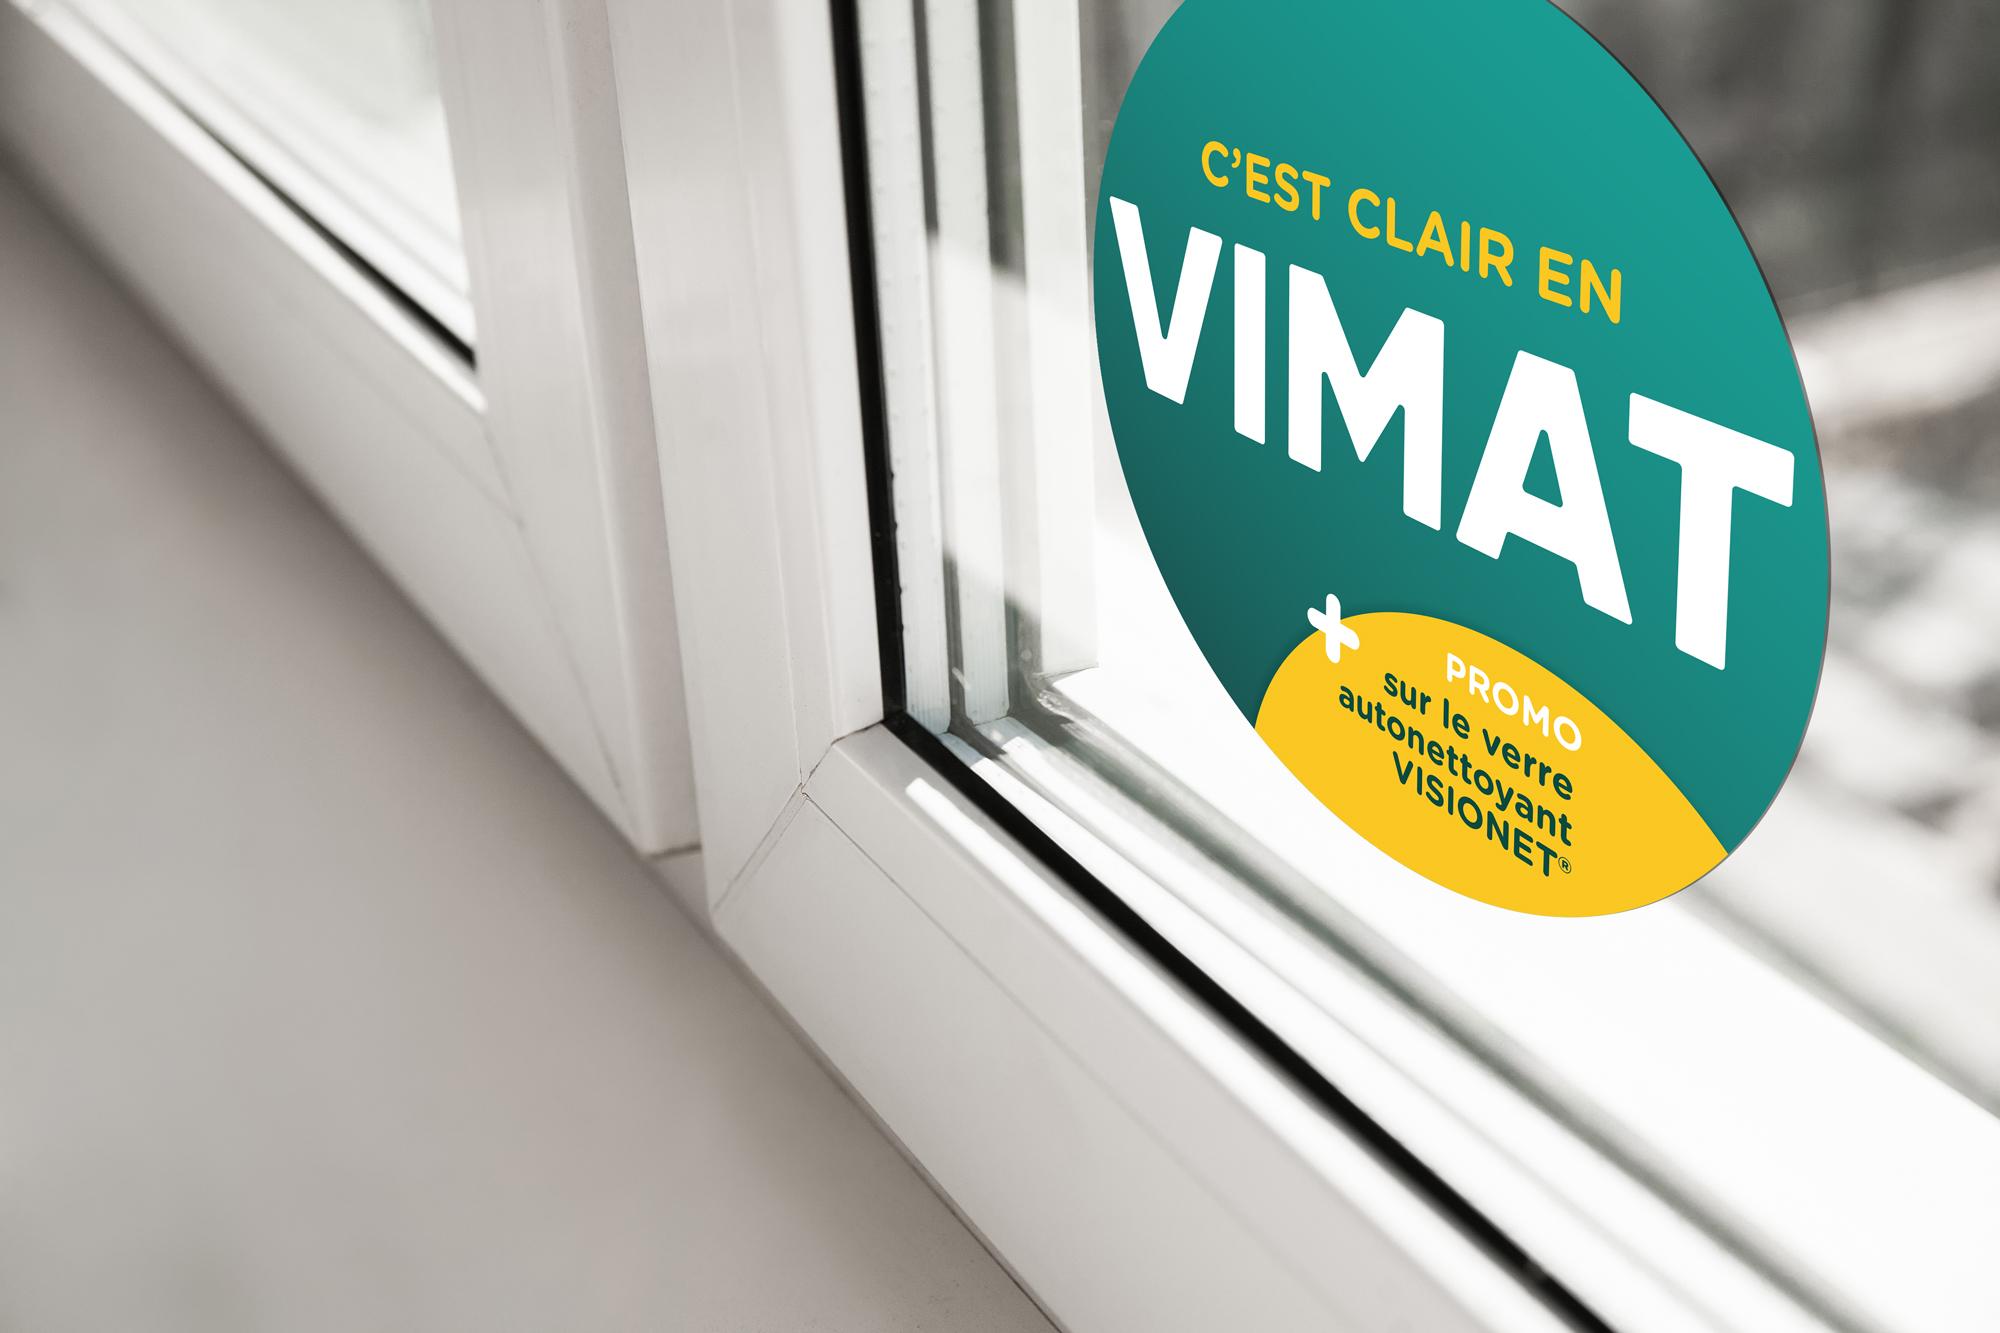 VIMAT DOORS AND WINDOWS